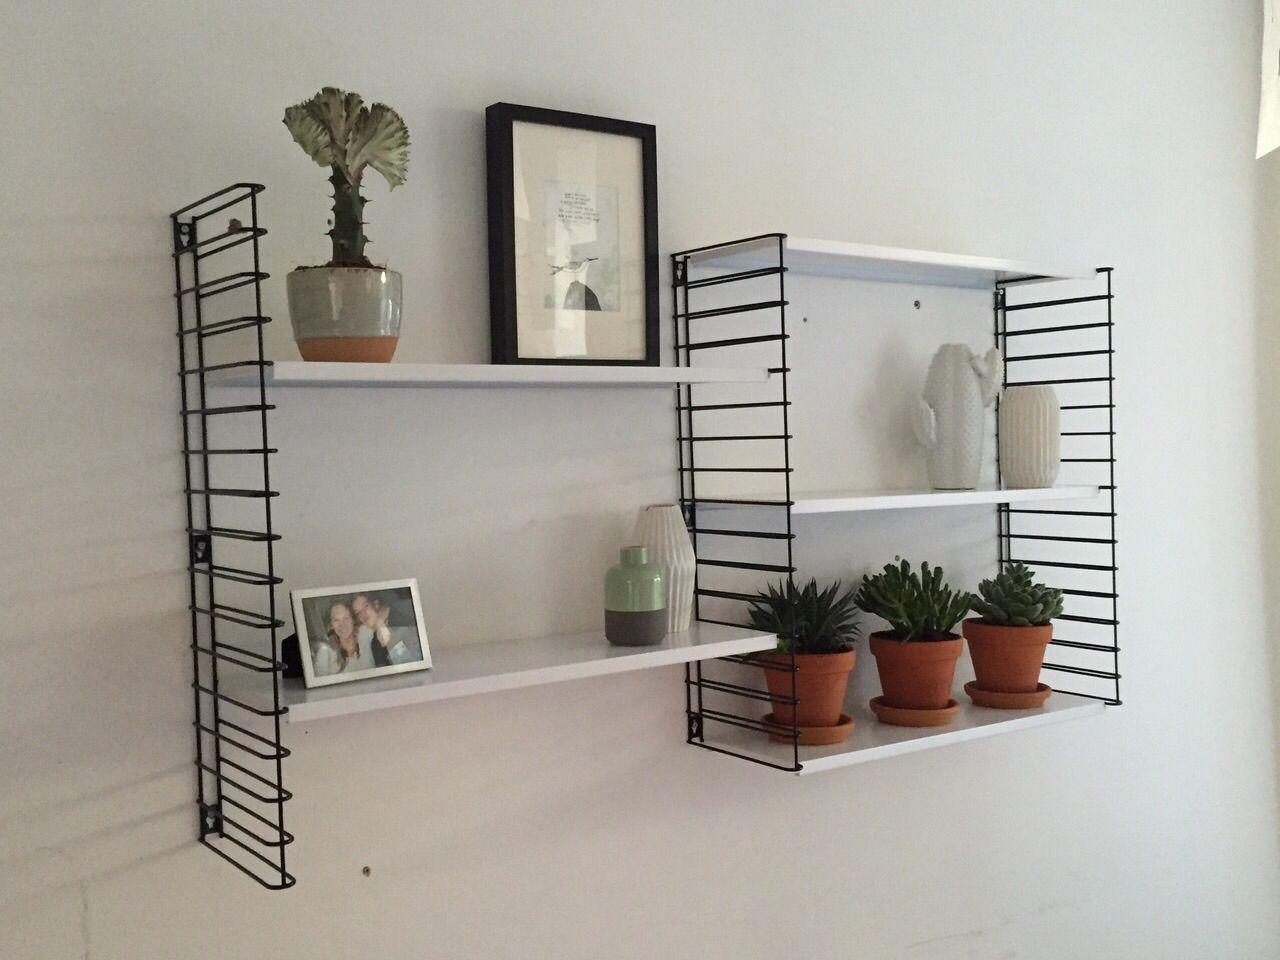 Het Tomado Rekje : Tomado shelves tomado wohnzimmer